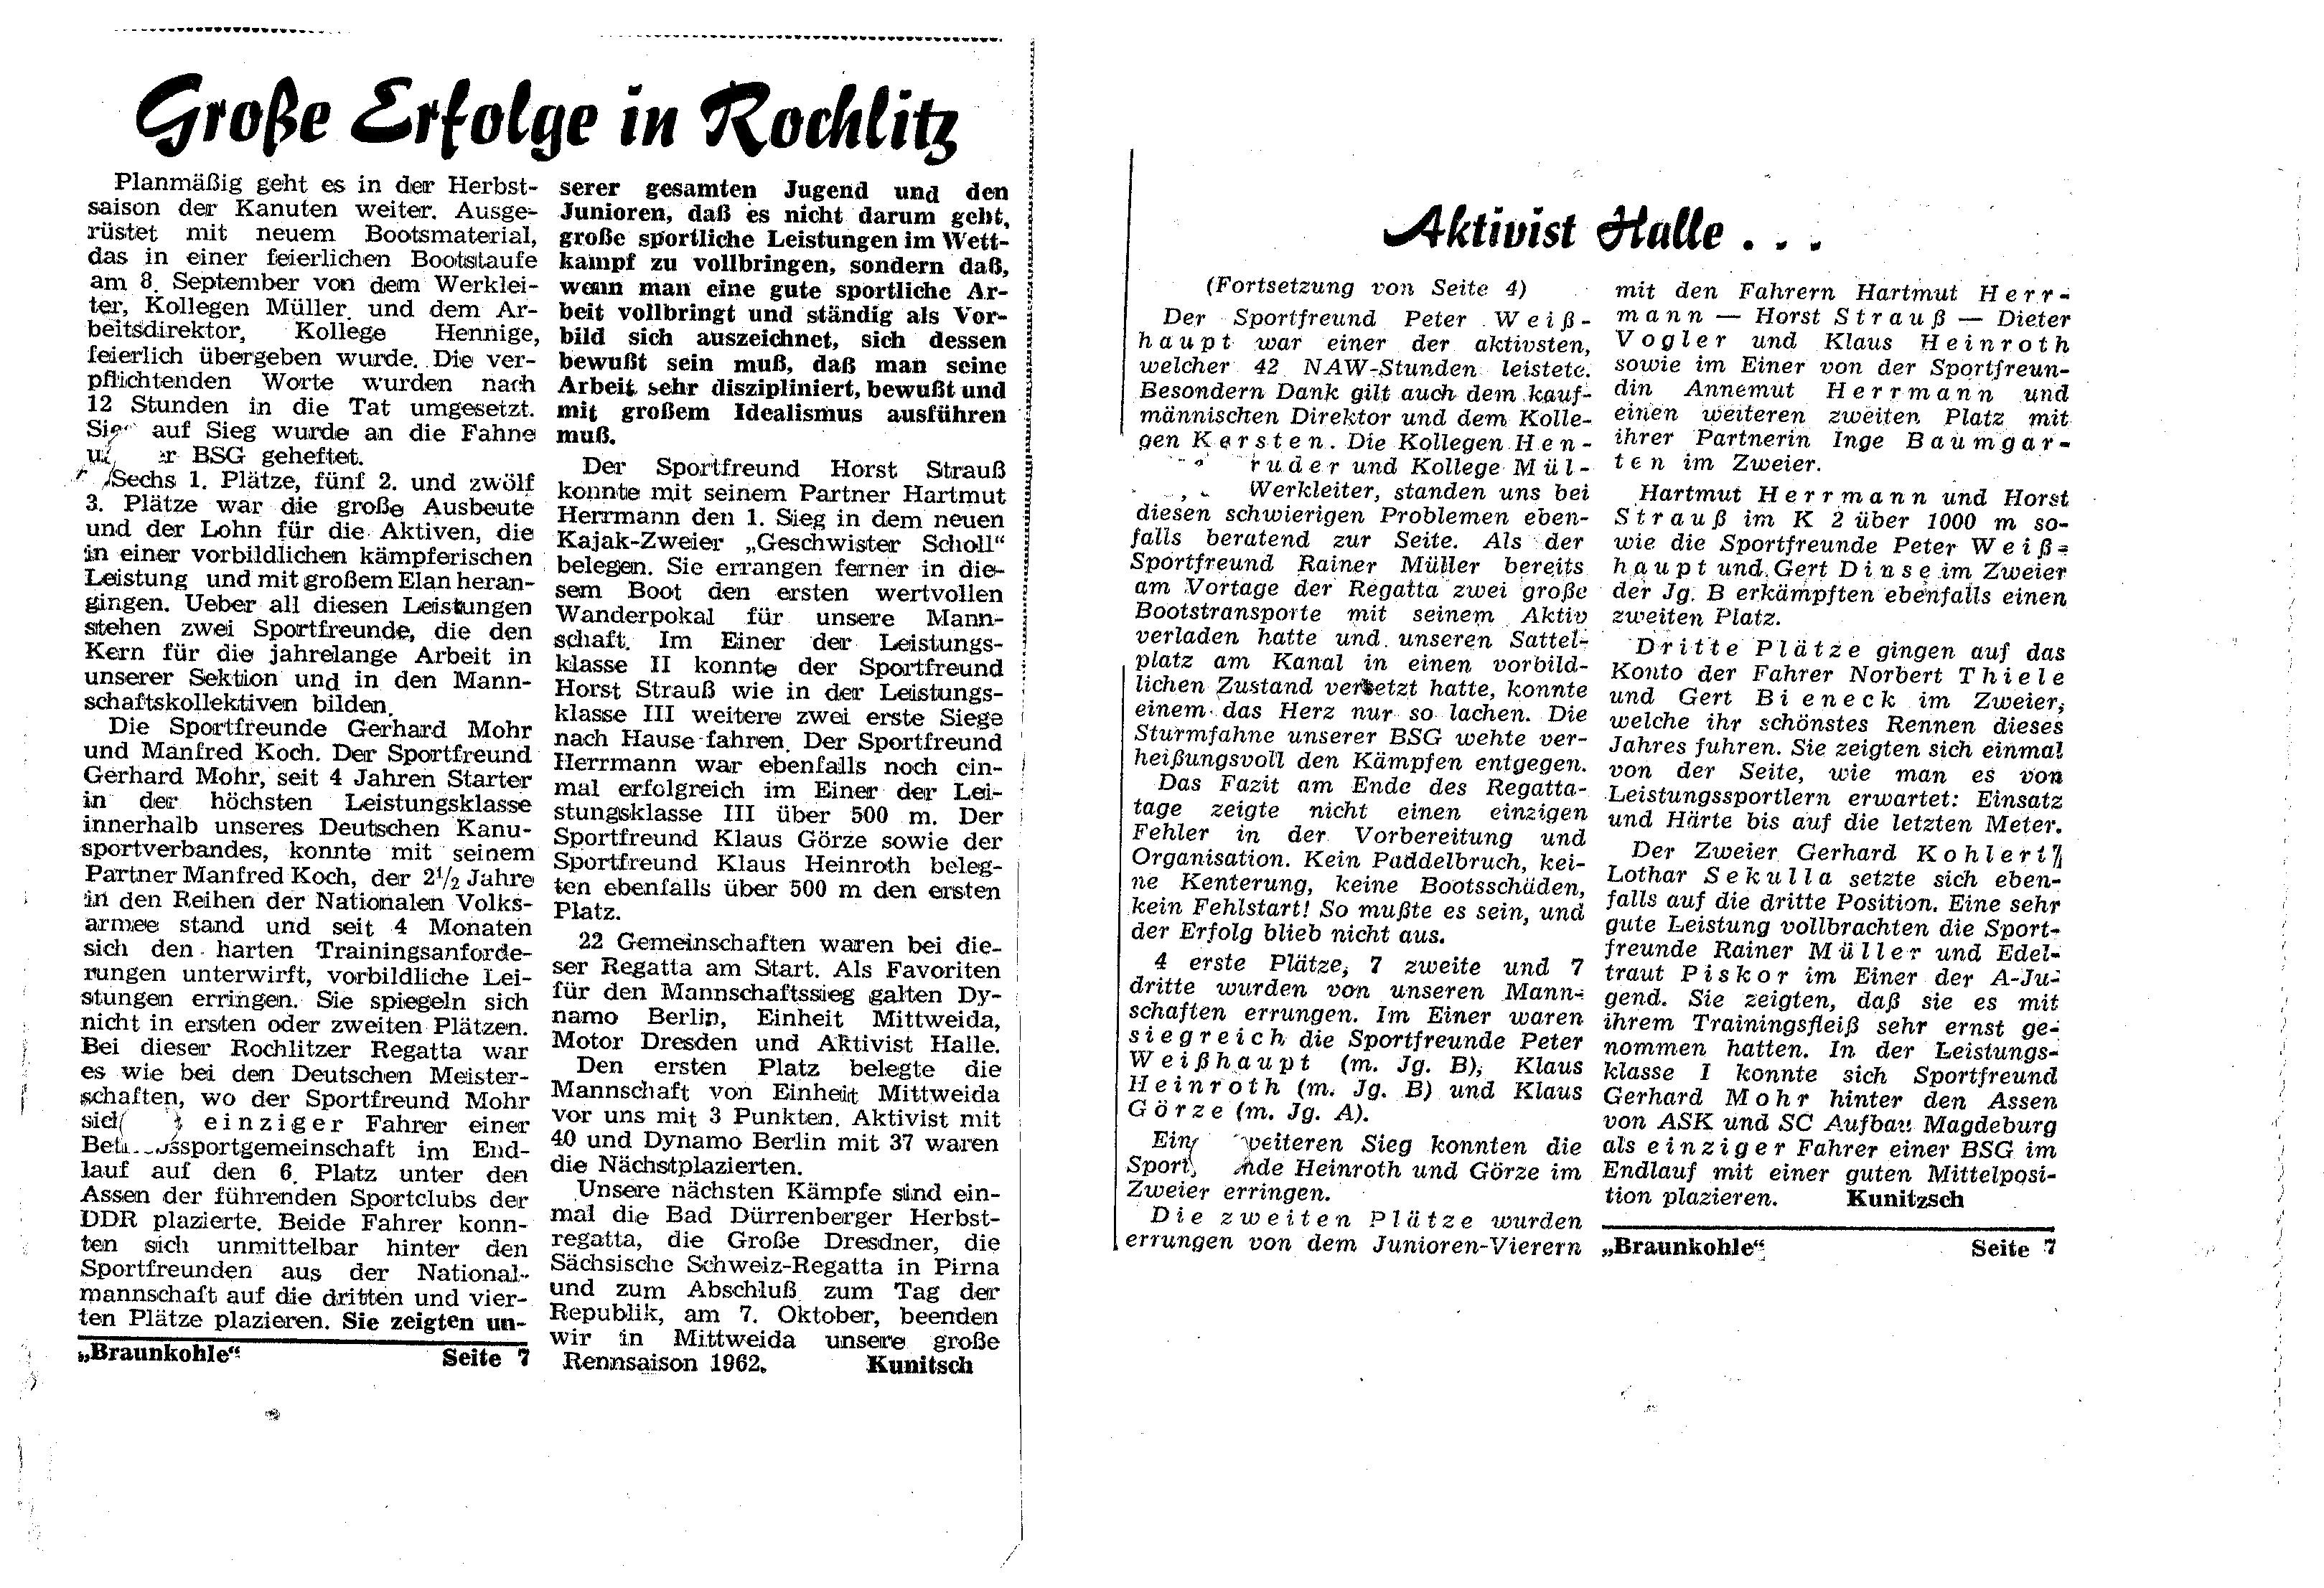 1962 Große erfolge in Rochlitz, Aktivist Halle